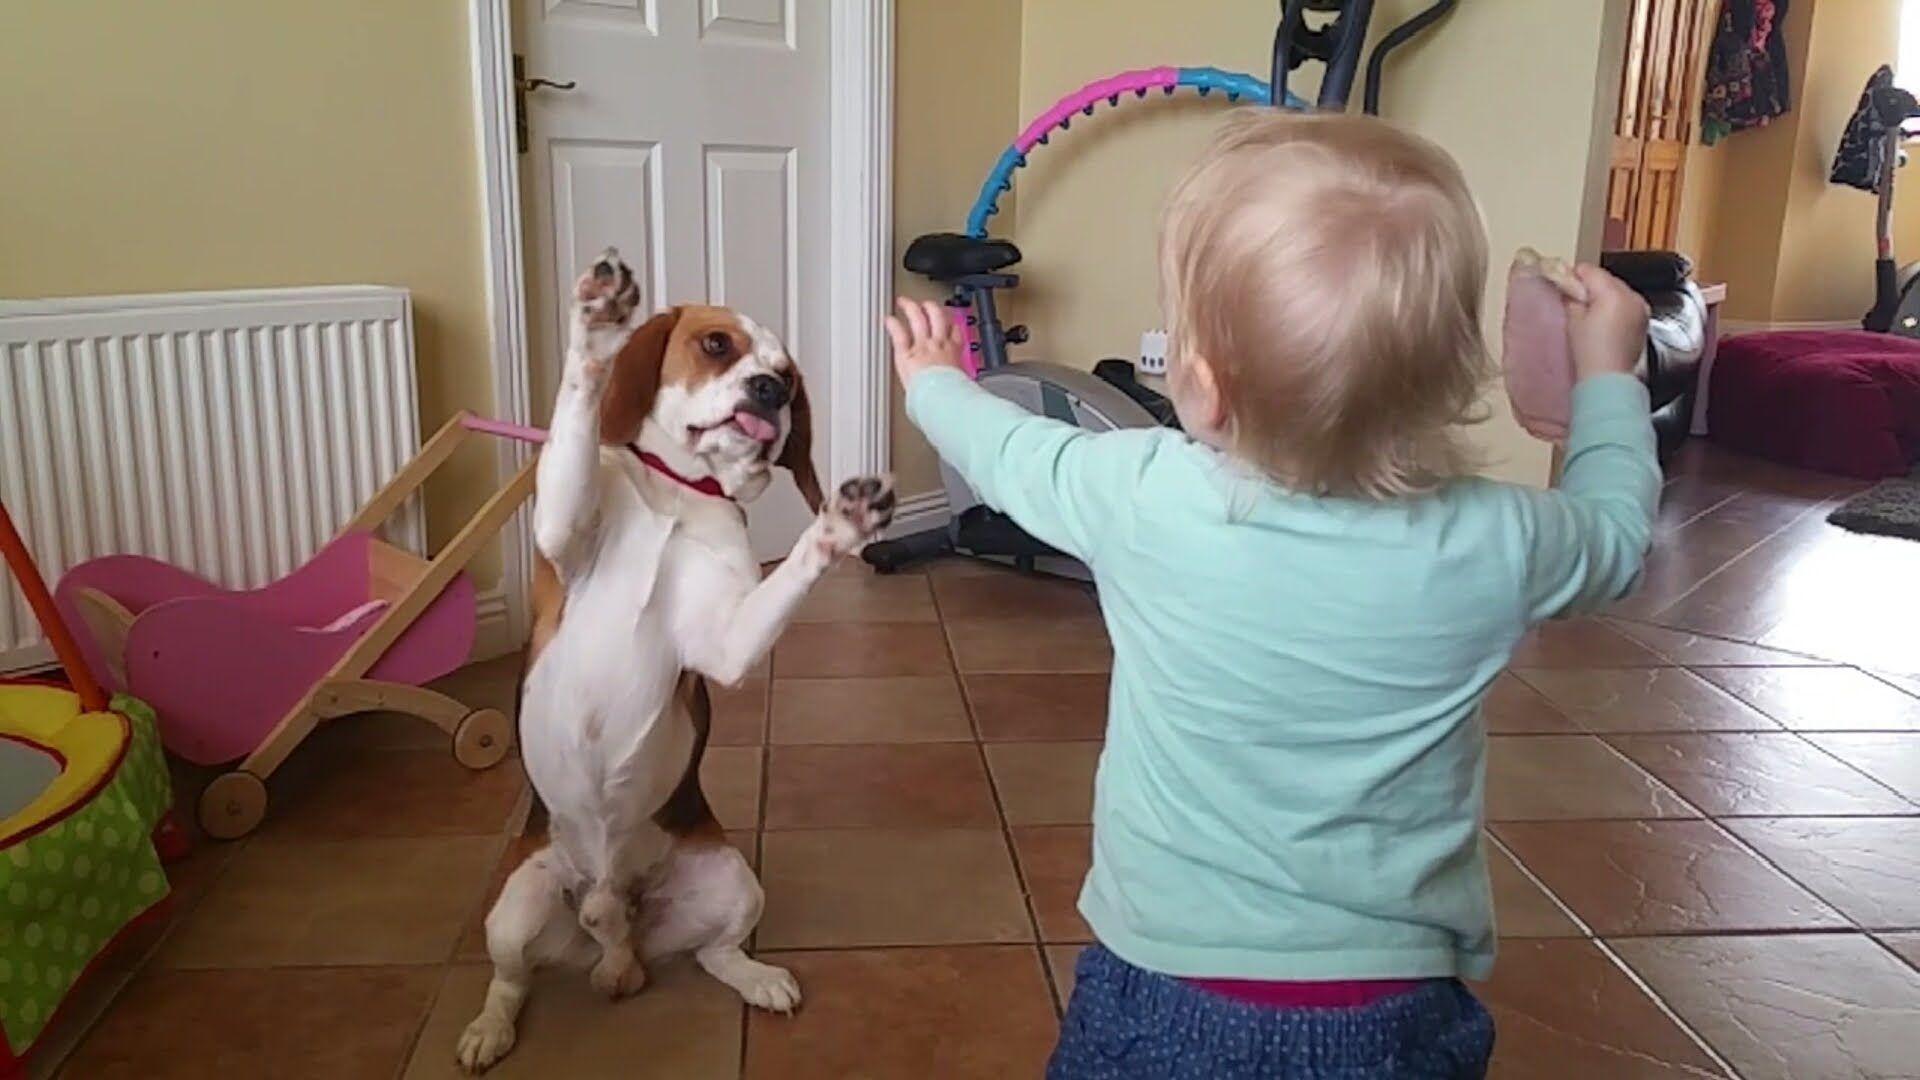 Good Video Beagle Adorable Dog - 9322cf1aac6a5ee70bcdea280d13cd66  You Should Have_52137  .jpg